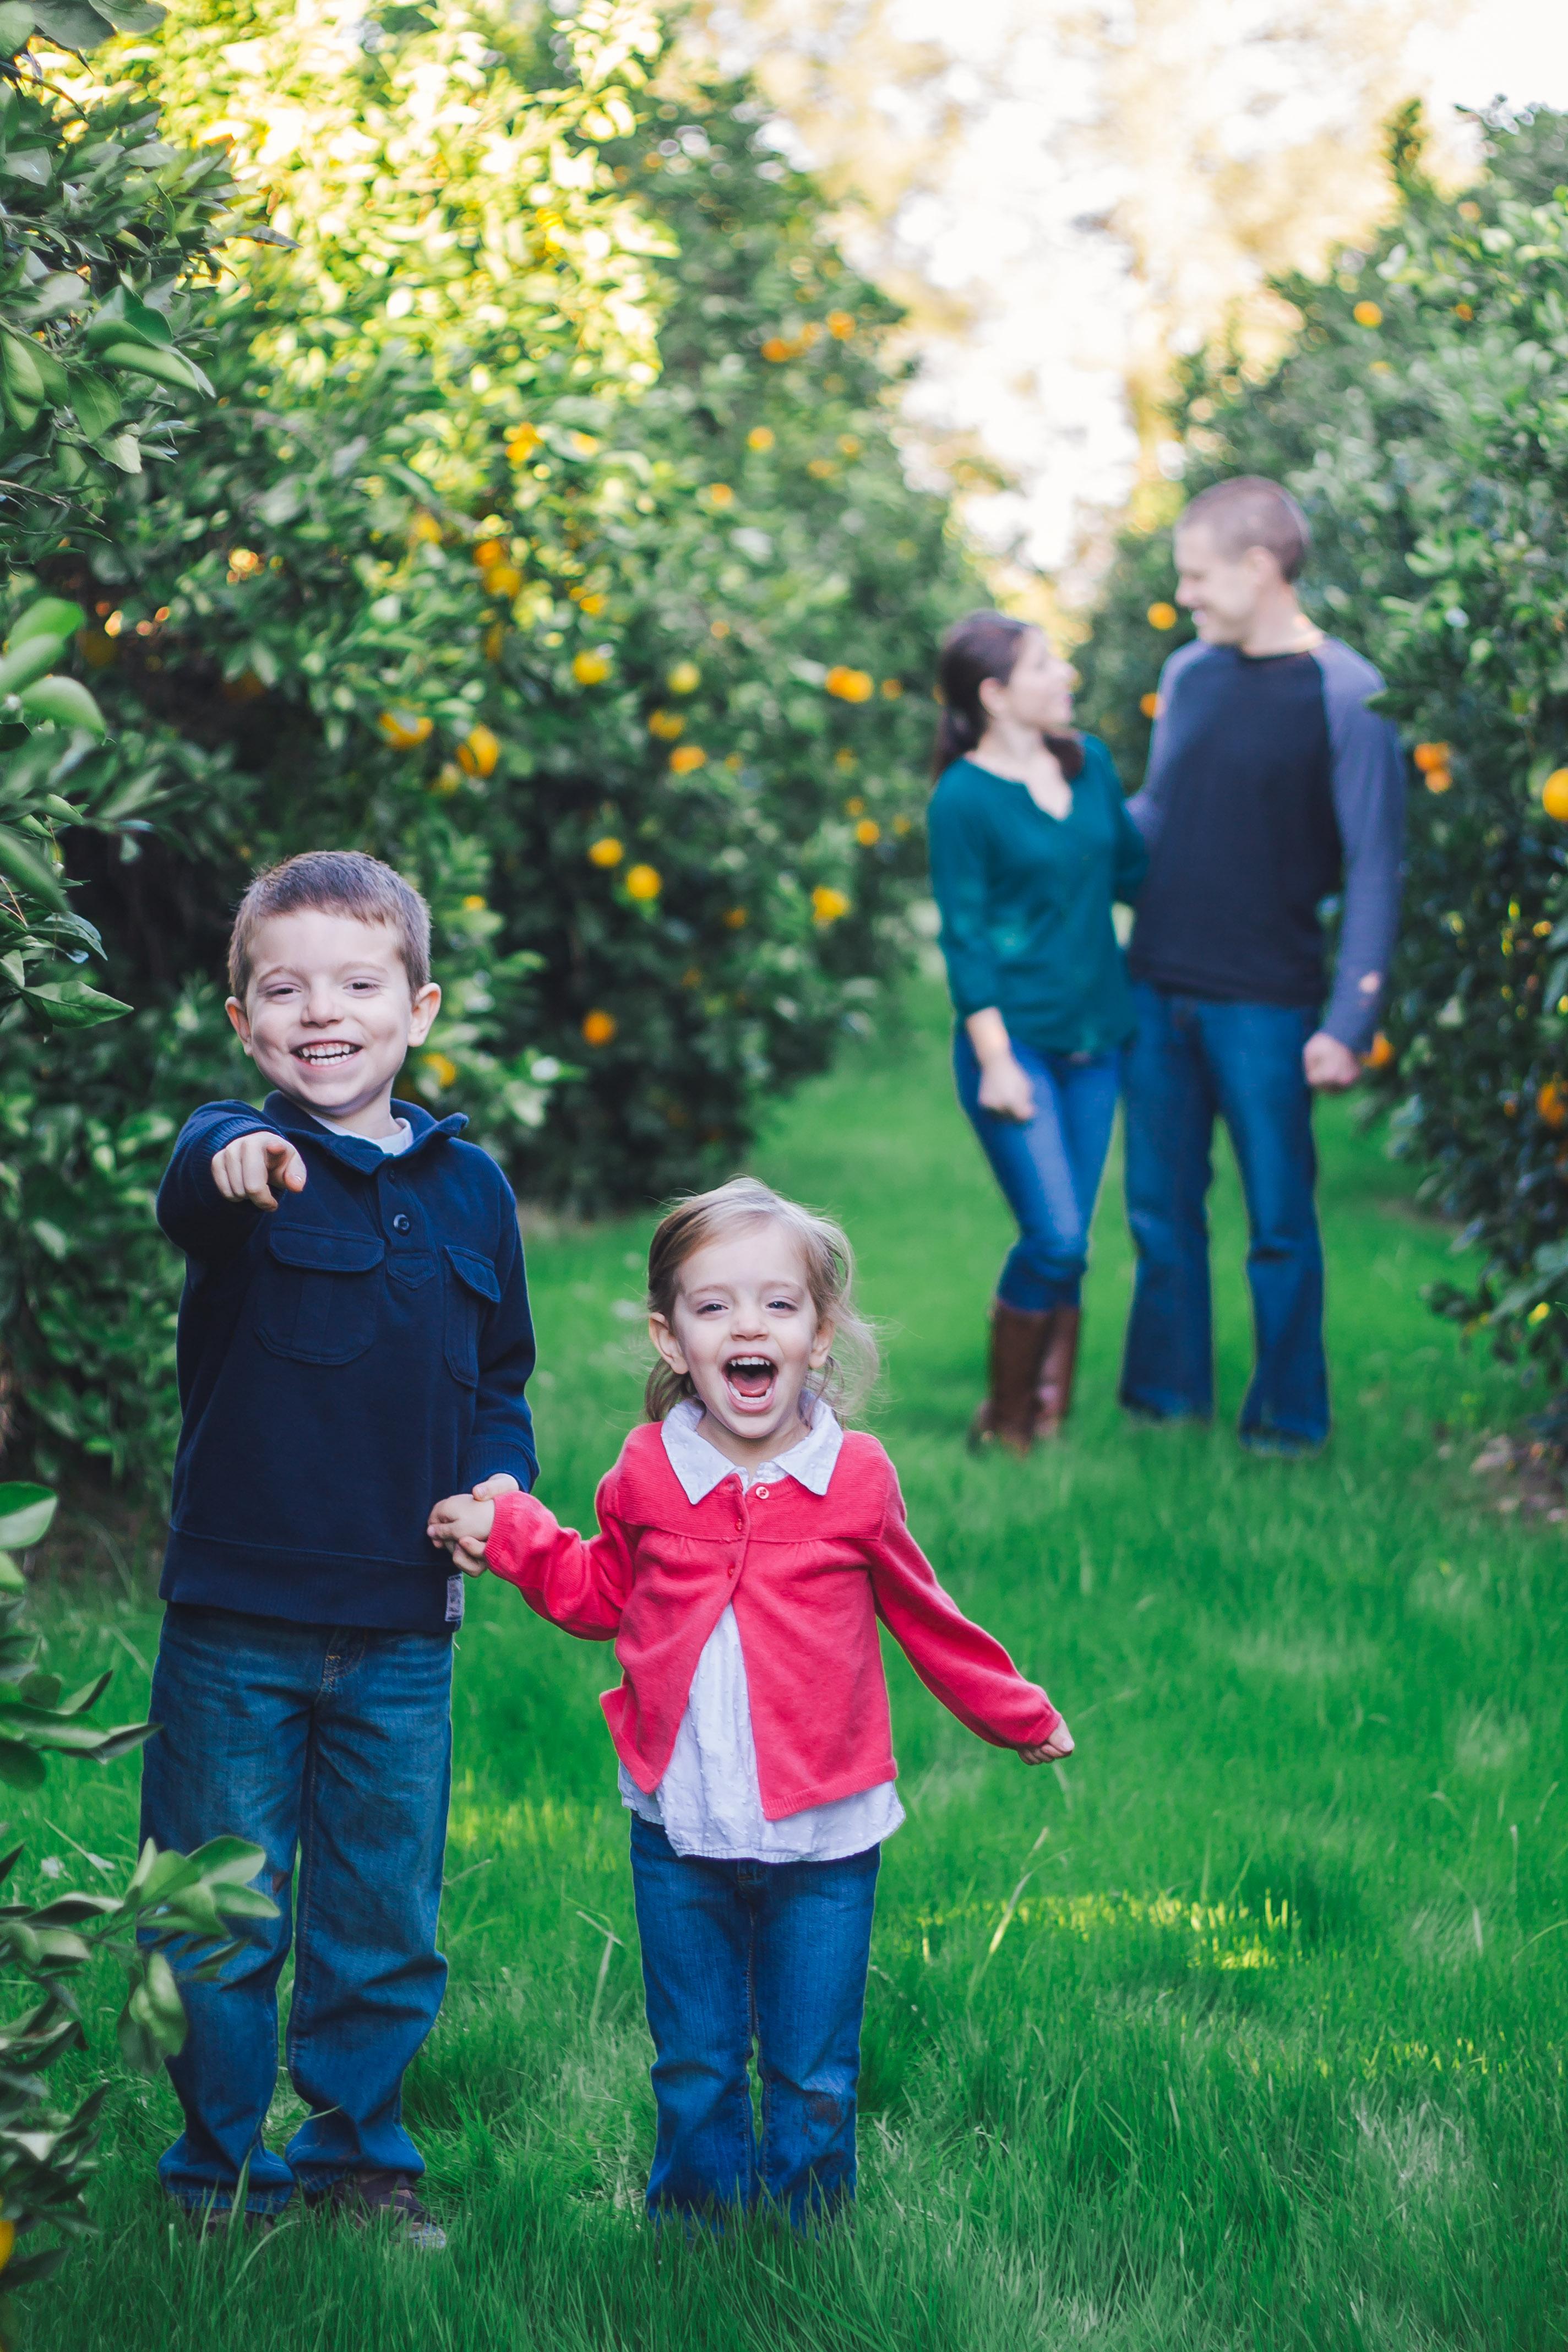 Sweet Family Pose {Alysa Bajenaru Photography}